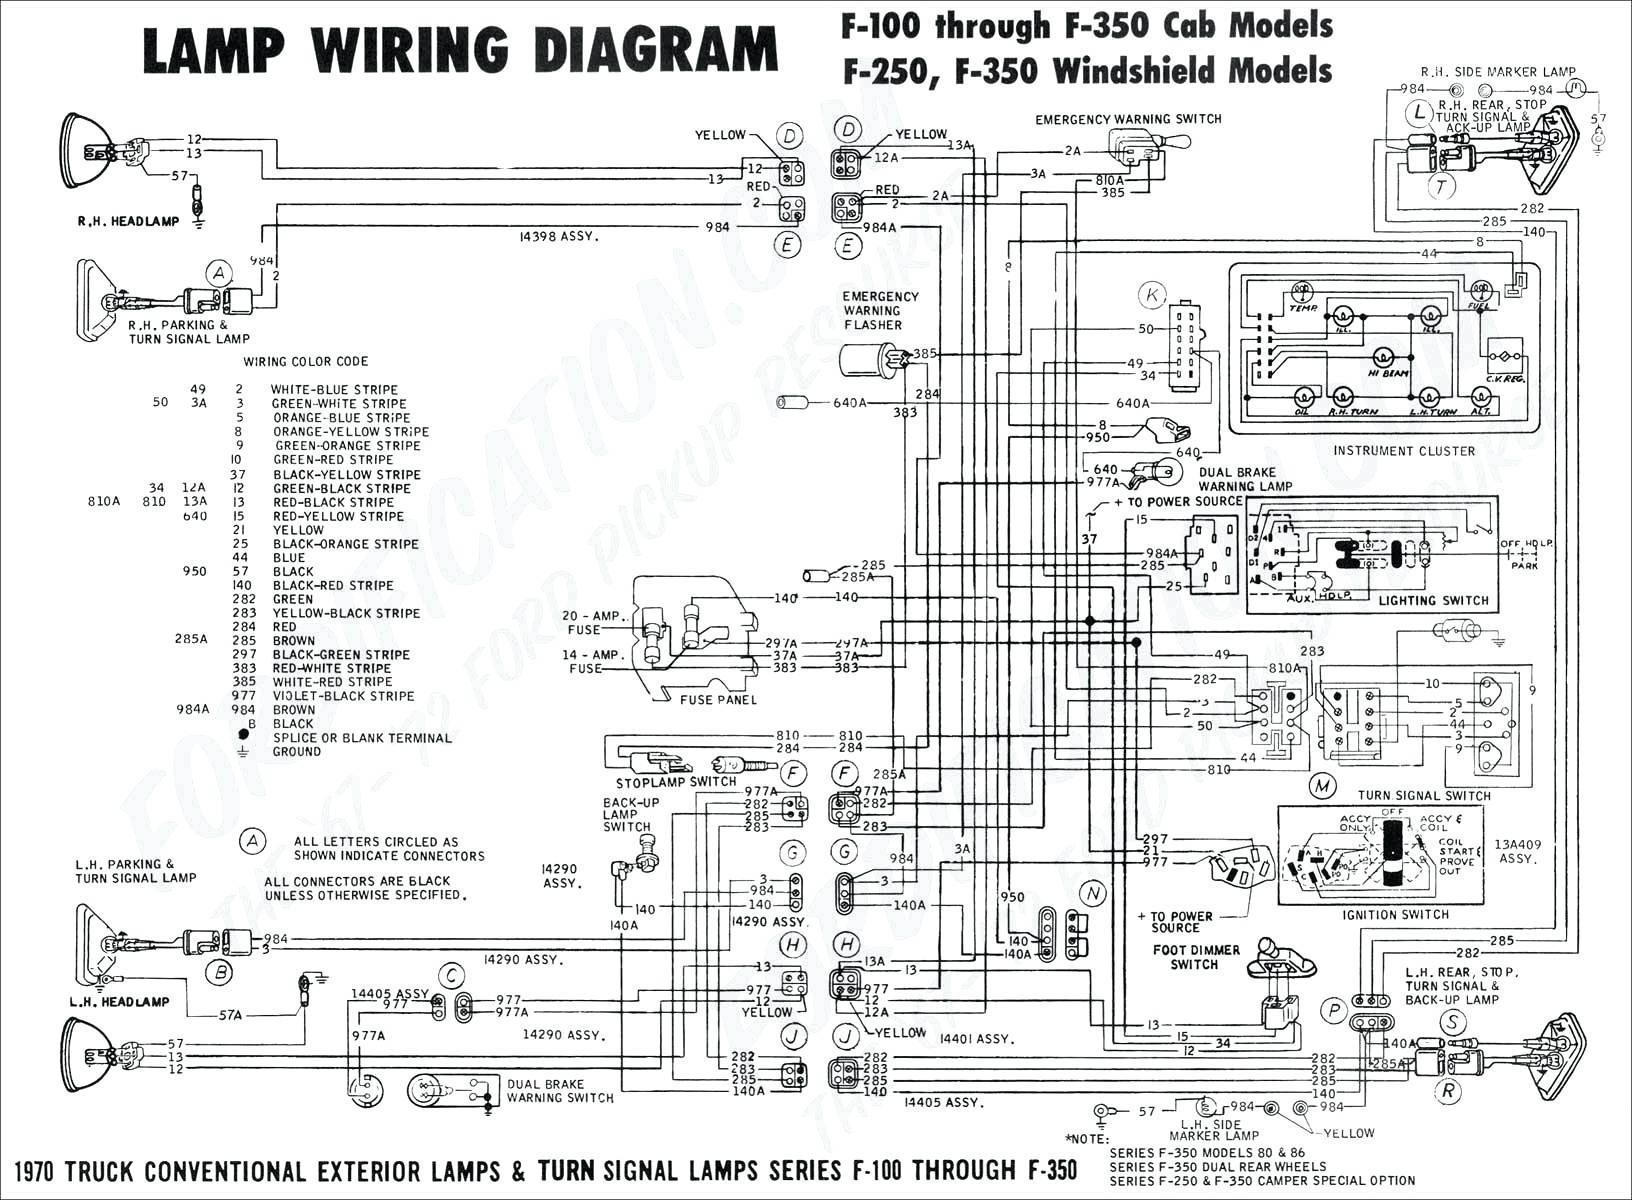 2002 Nissan Xterra Engine Diagram 2010 Xterra Wiring Diagram Wiring Diagram Datasource Of 2002 Nissan Xterra Engine Diagram 2006 Nissan Sentra Wiring Diagram Wiring Diagram for You